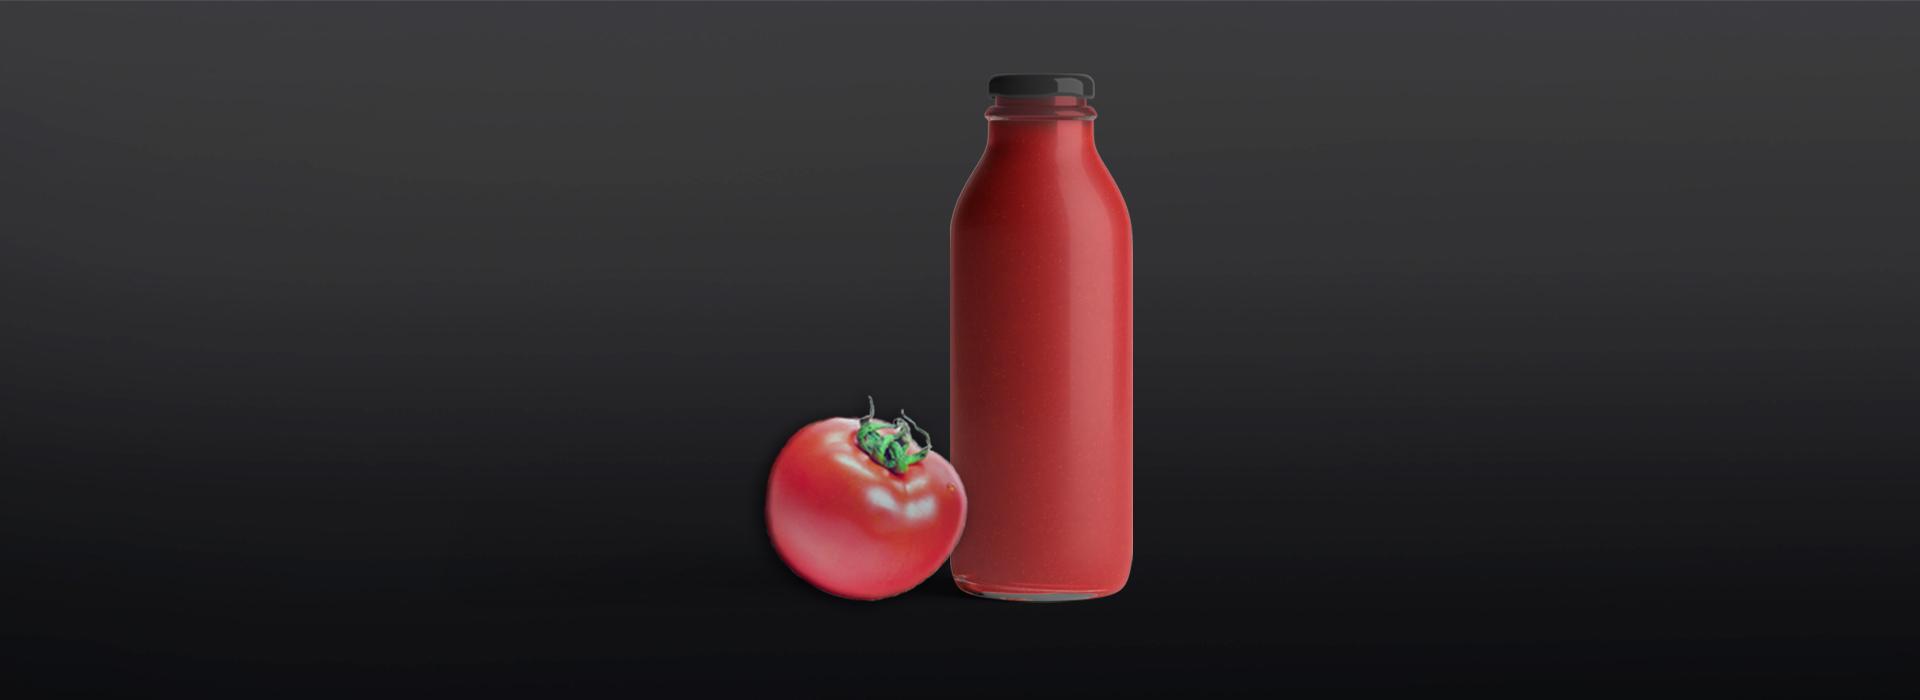 sraml-tomato-juice